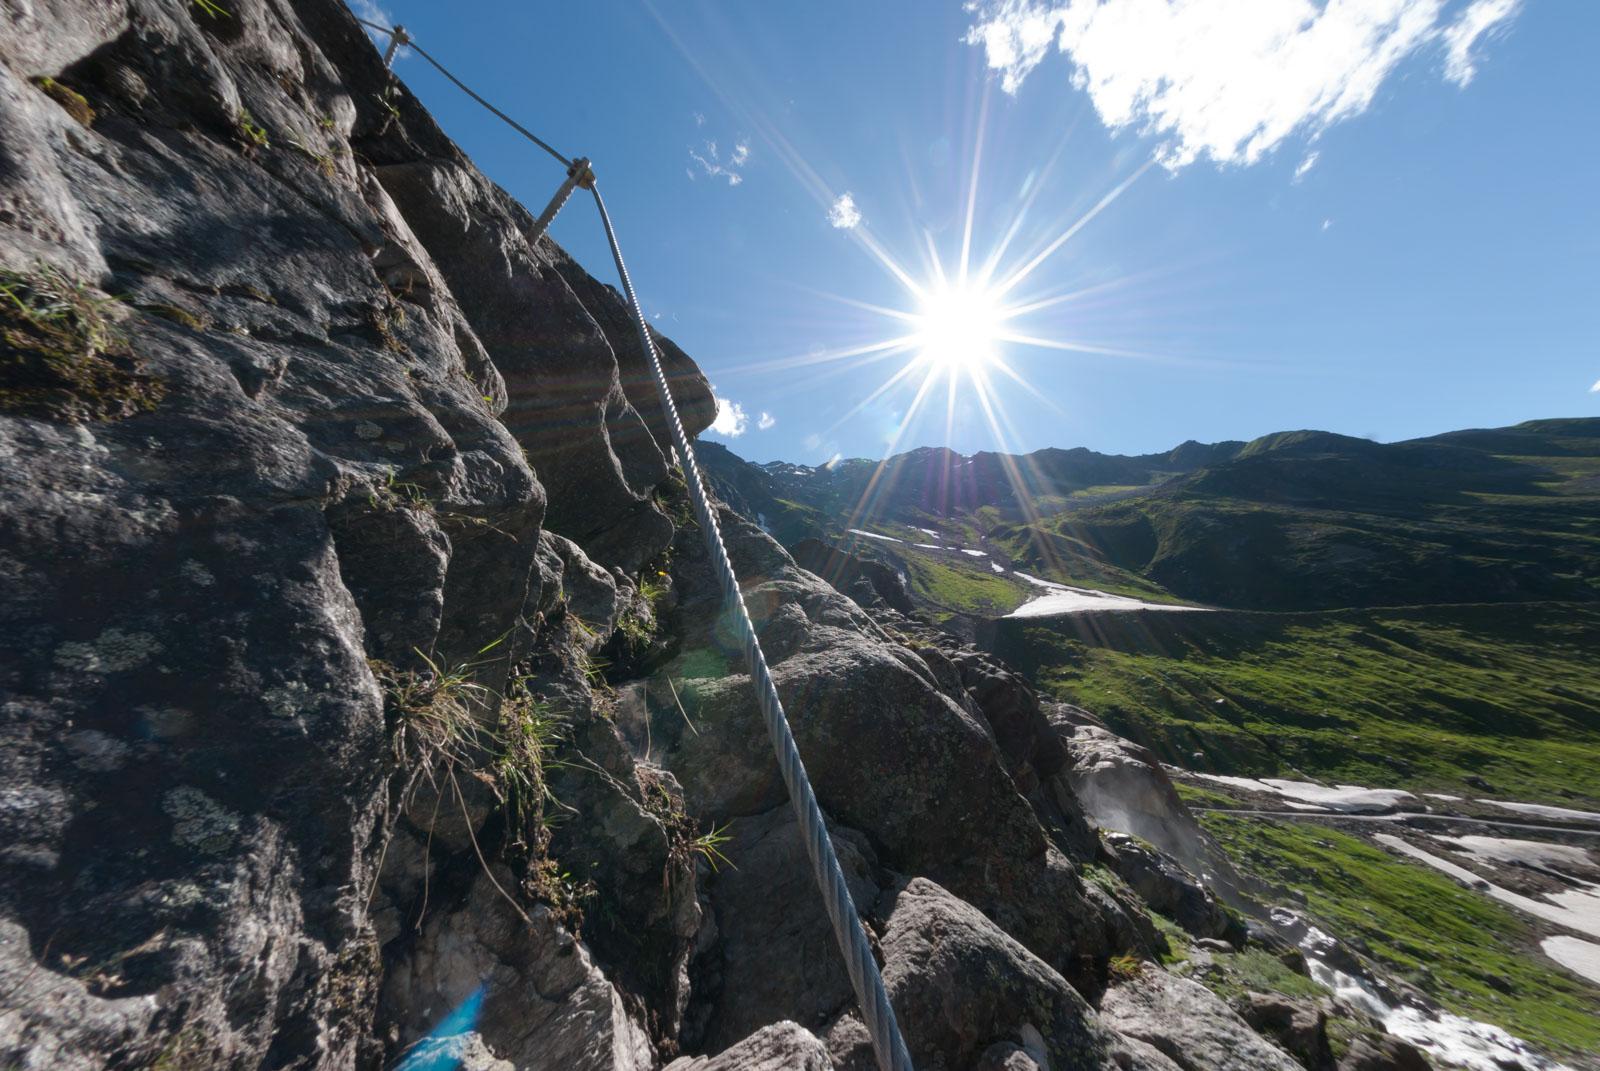 Pitztaler Steinbock Klettersteig Familien-Route